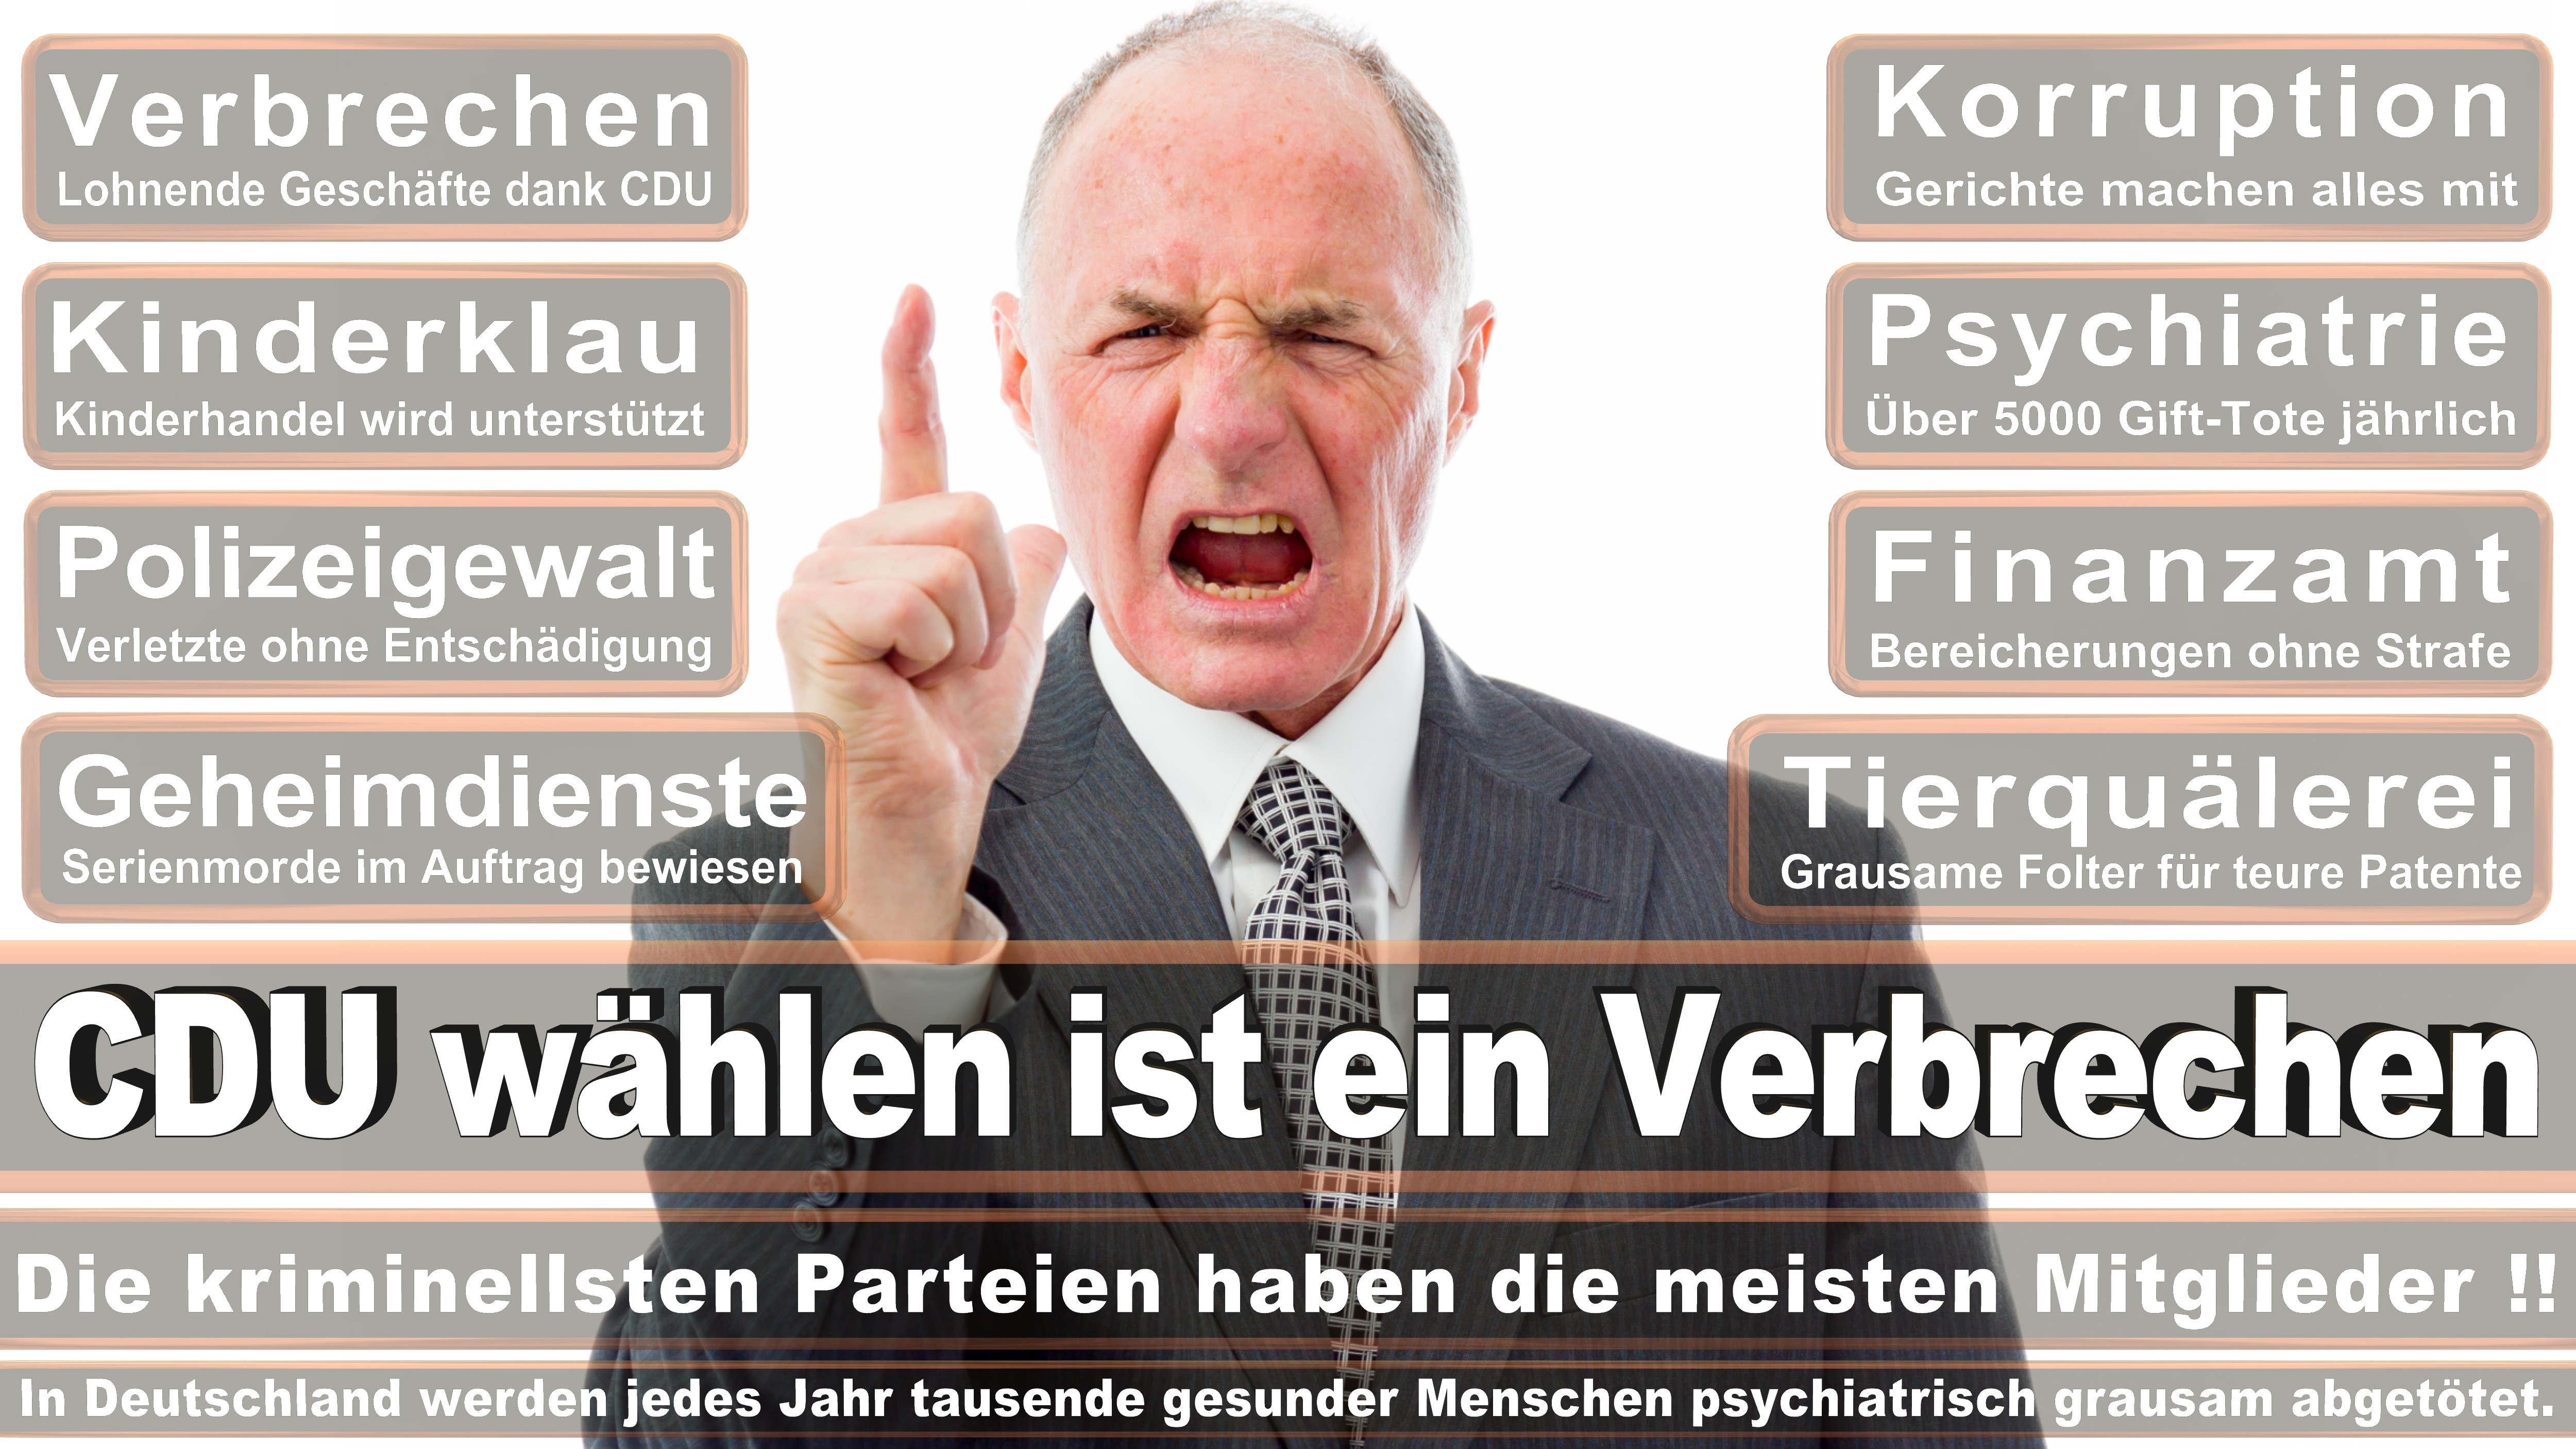 Rüdiger Kruse CDU CSU Politiker